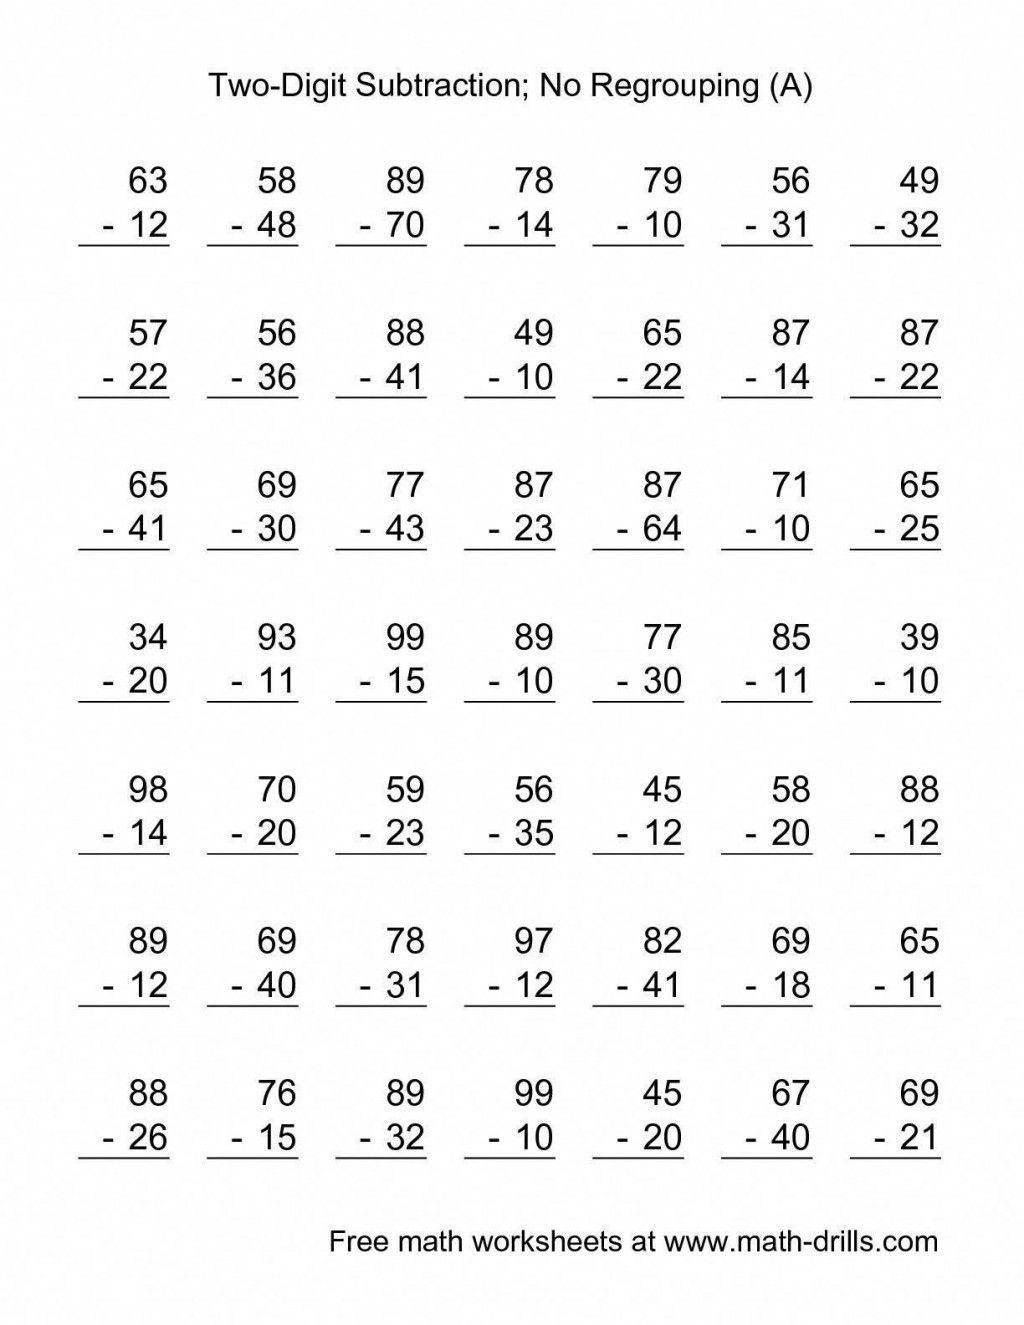 medium resolution of 4 Worksheet Free Math Worksheets First Grade 1 Addition Add In Columns 2  Dig…   2nd grade math worksheets